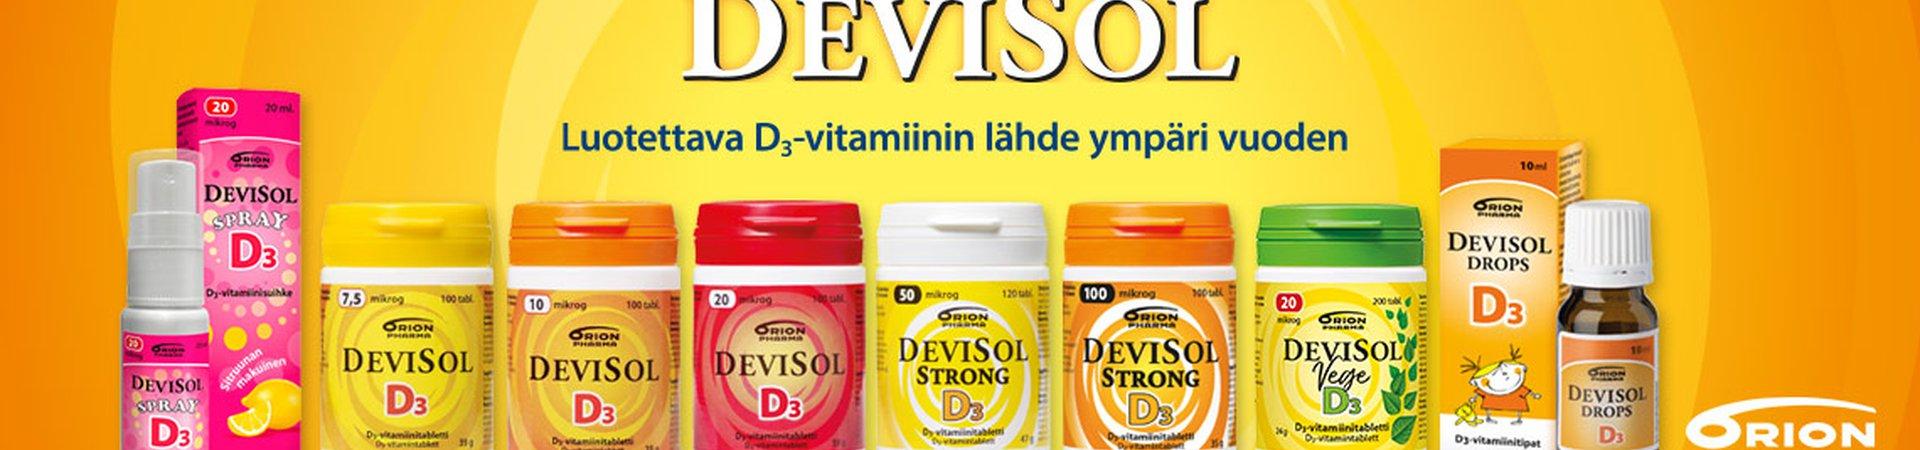 Devisol, D-vitamiini, syksy, vastustuskyky